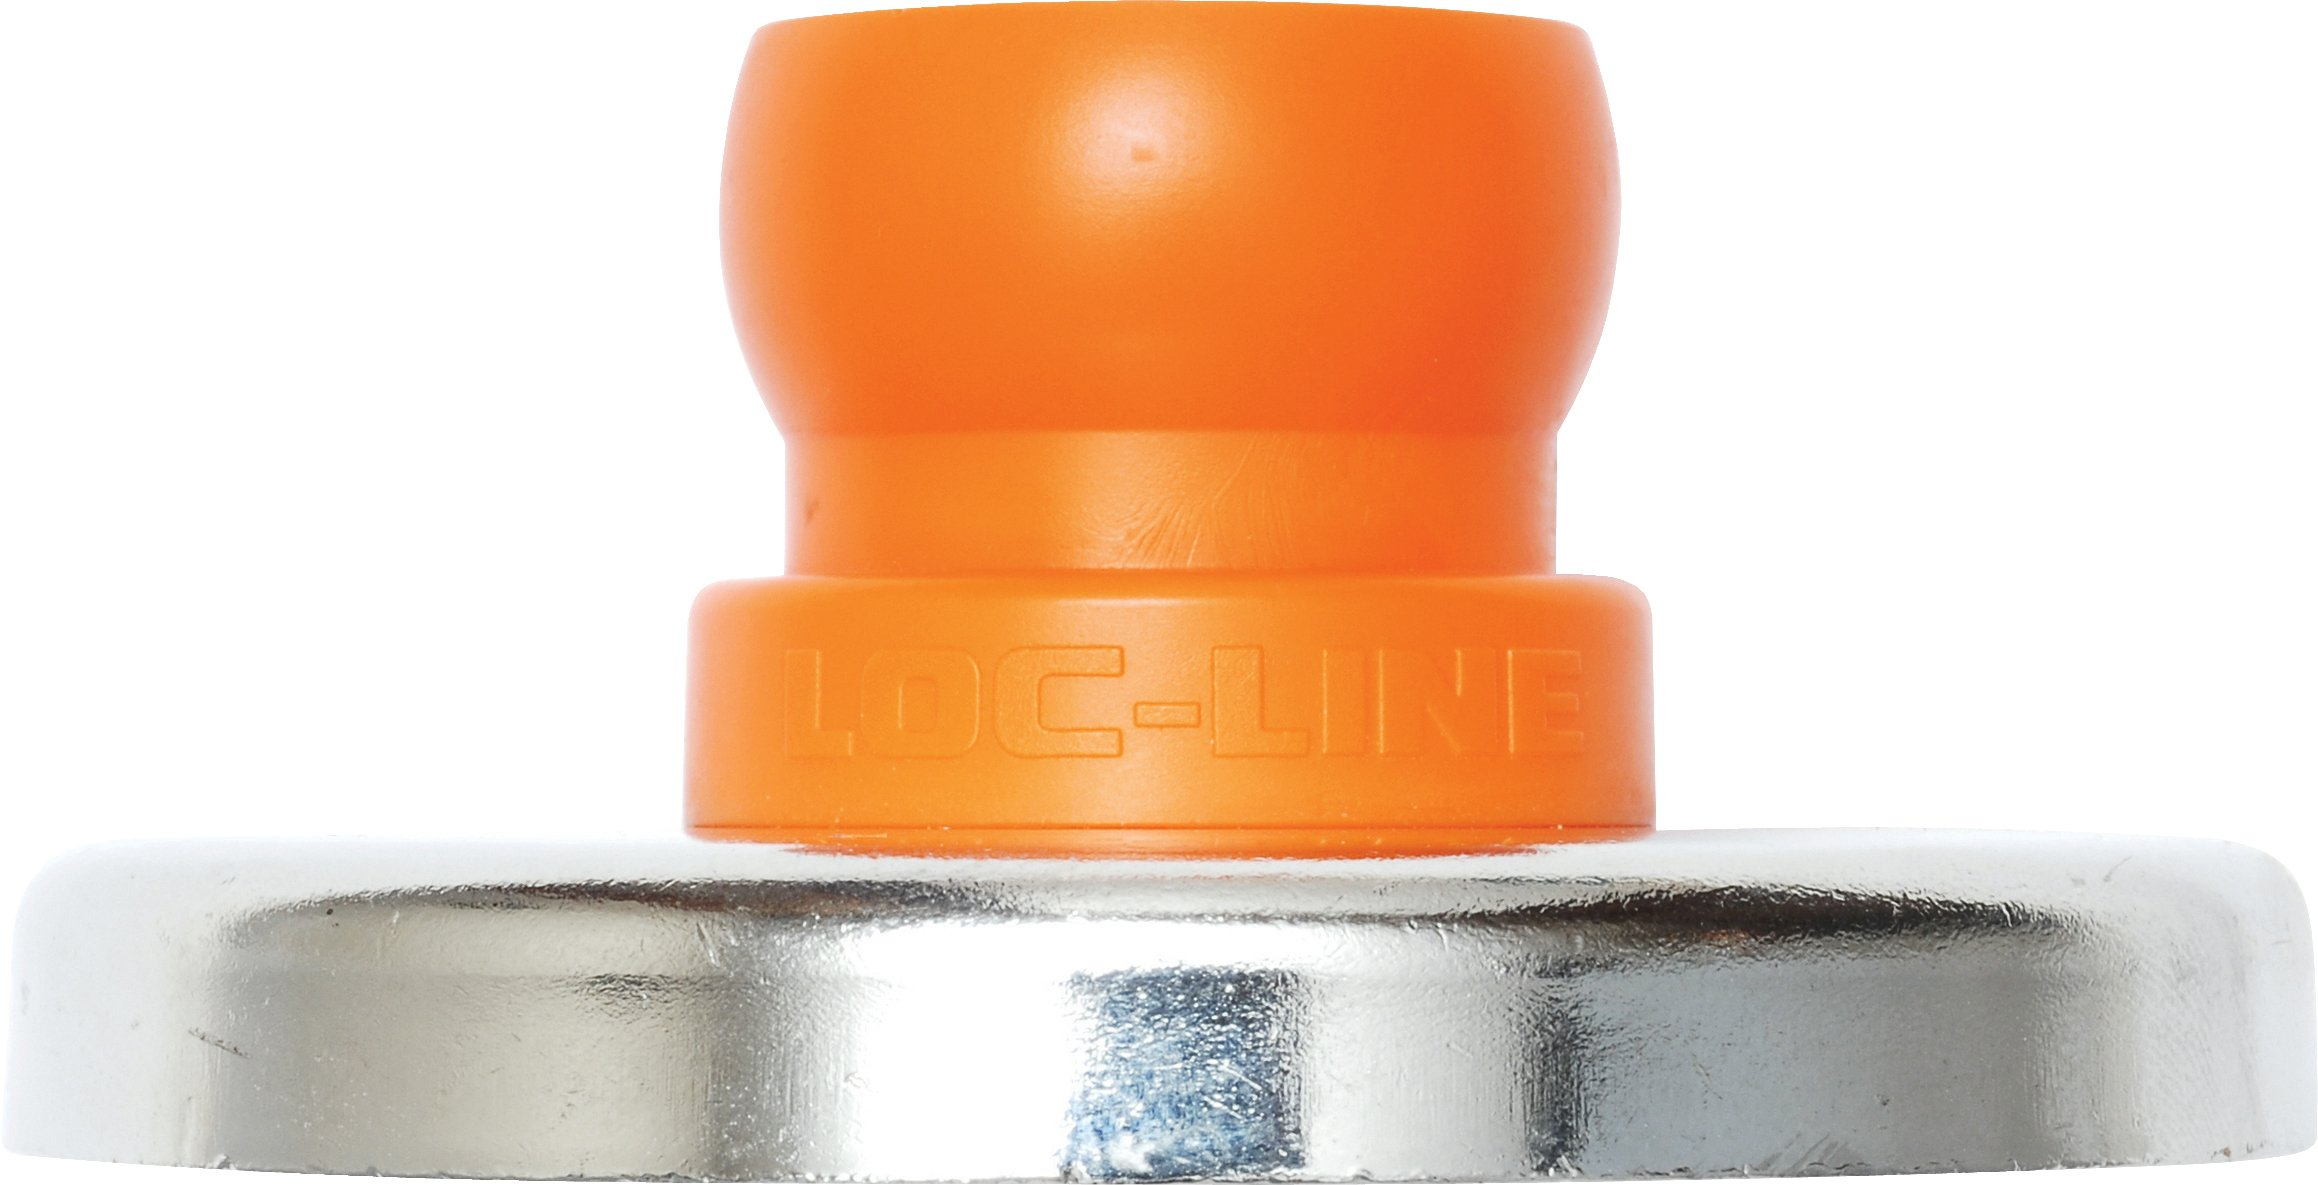 Loc-Line Coolant Hose Component, Acetal Copolymer, Magnetic Base, 3/4'' Hose ID